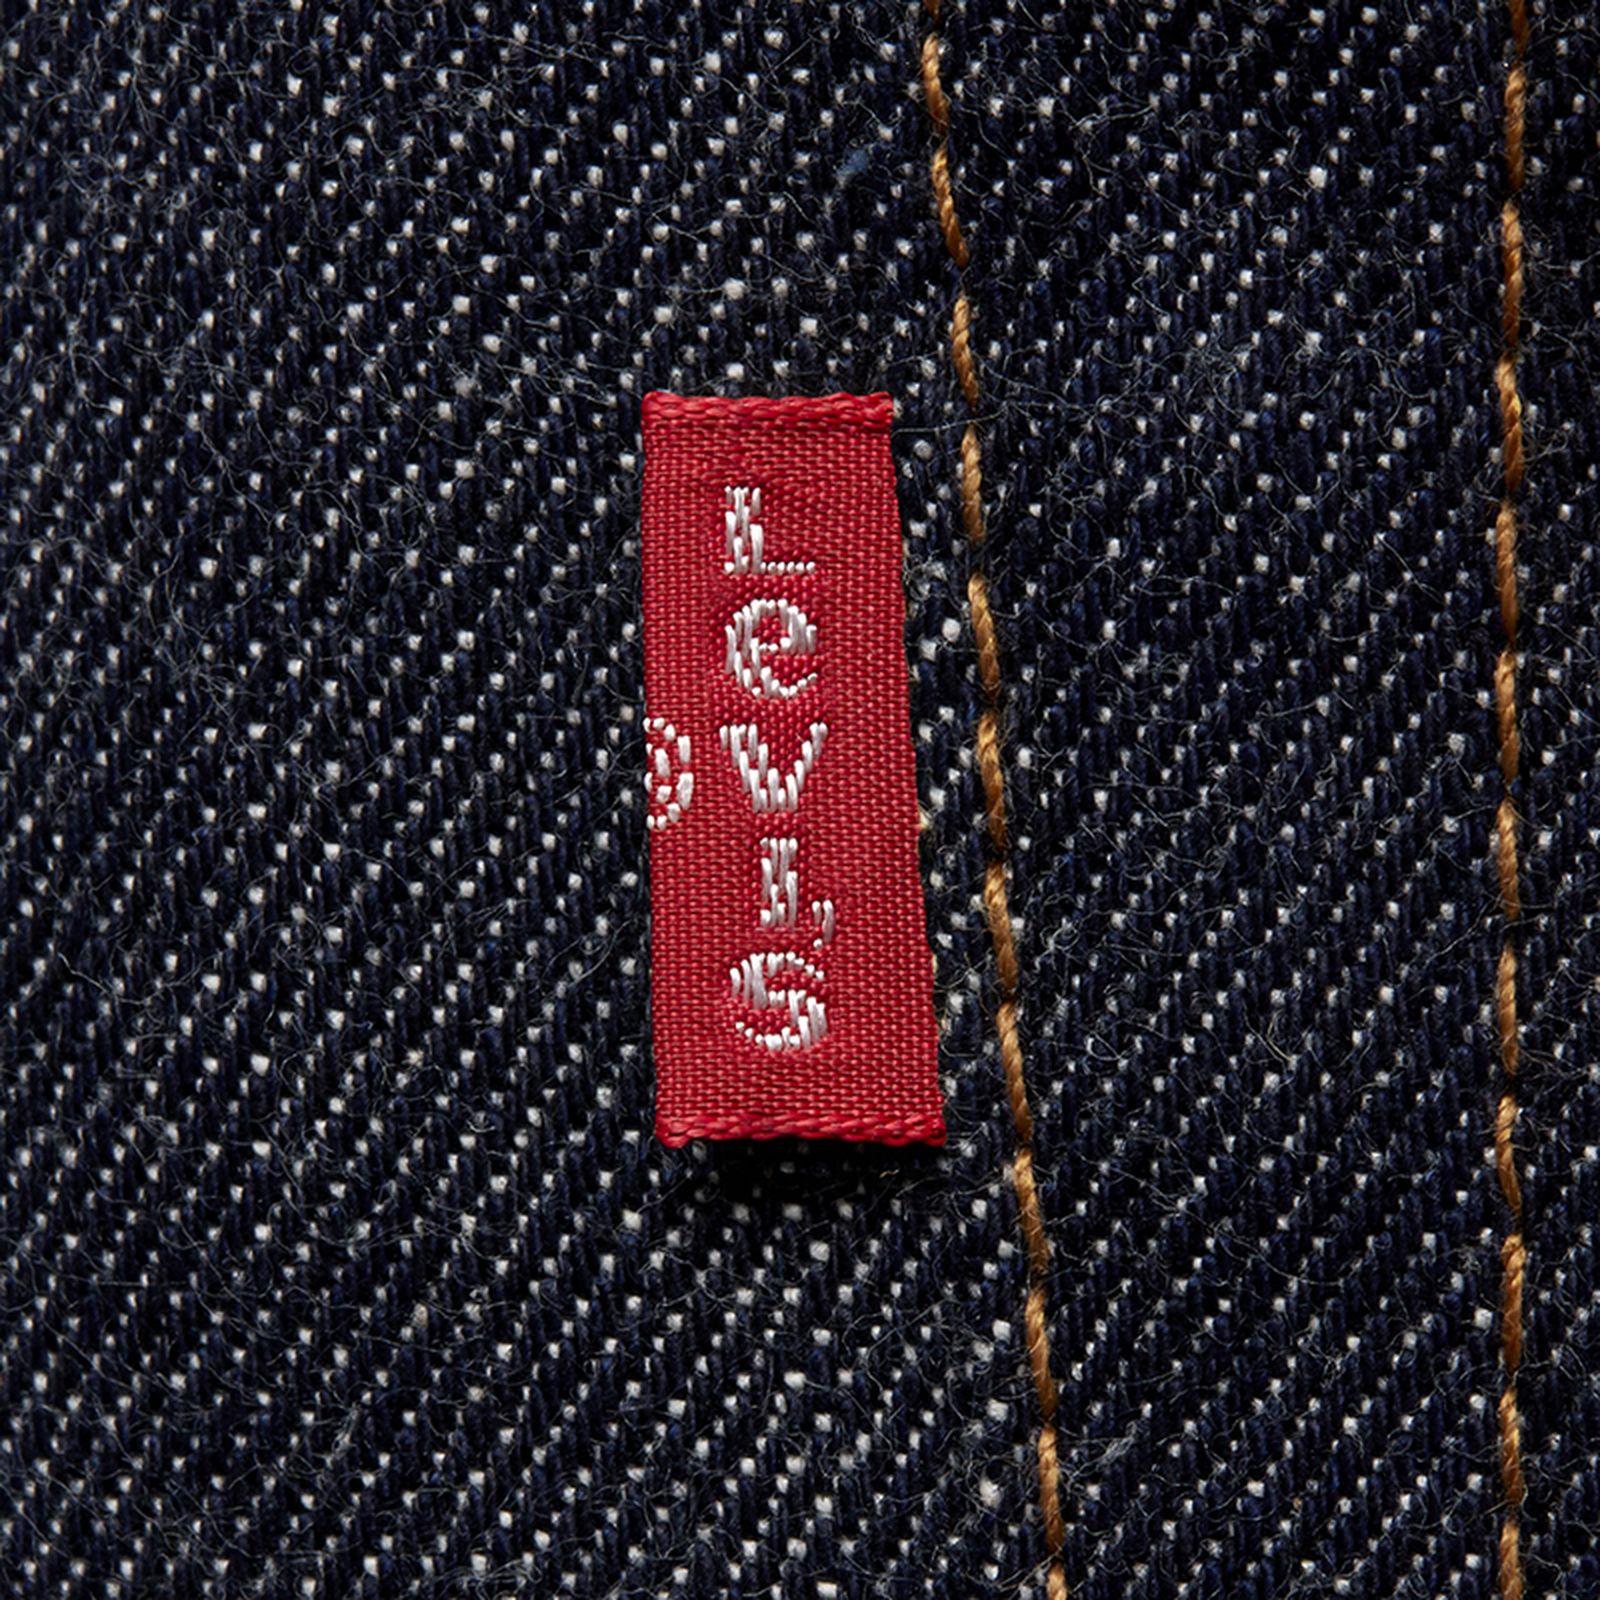 levis-golf-wang-501-day-1-01